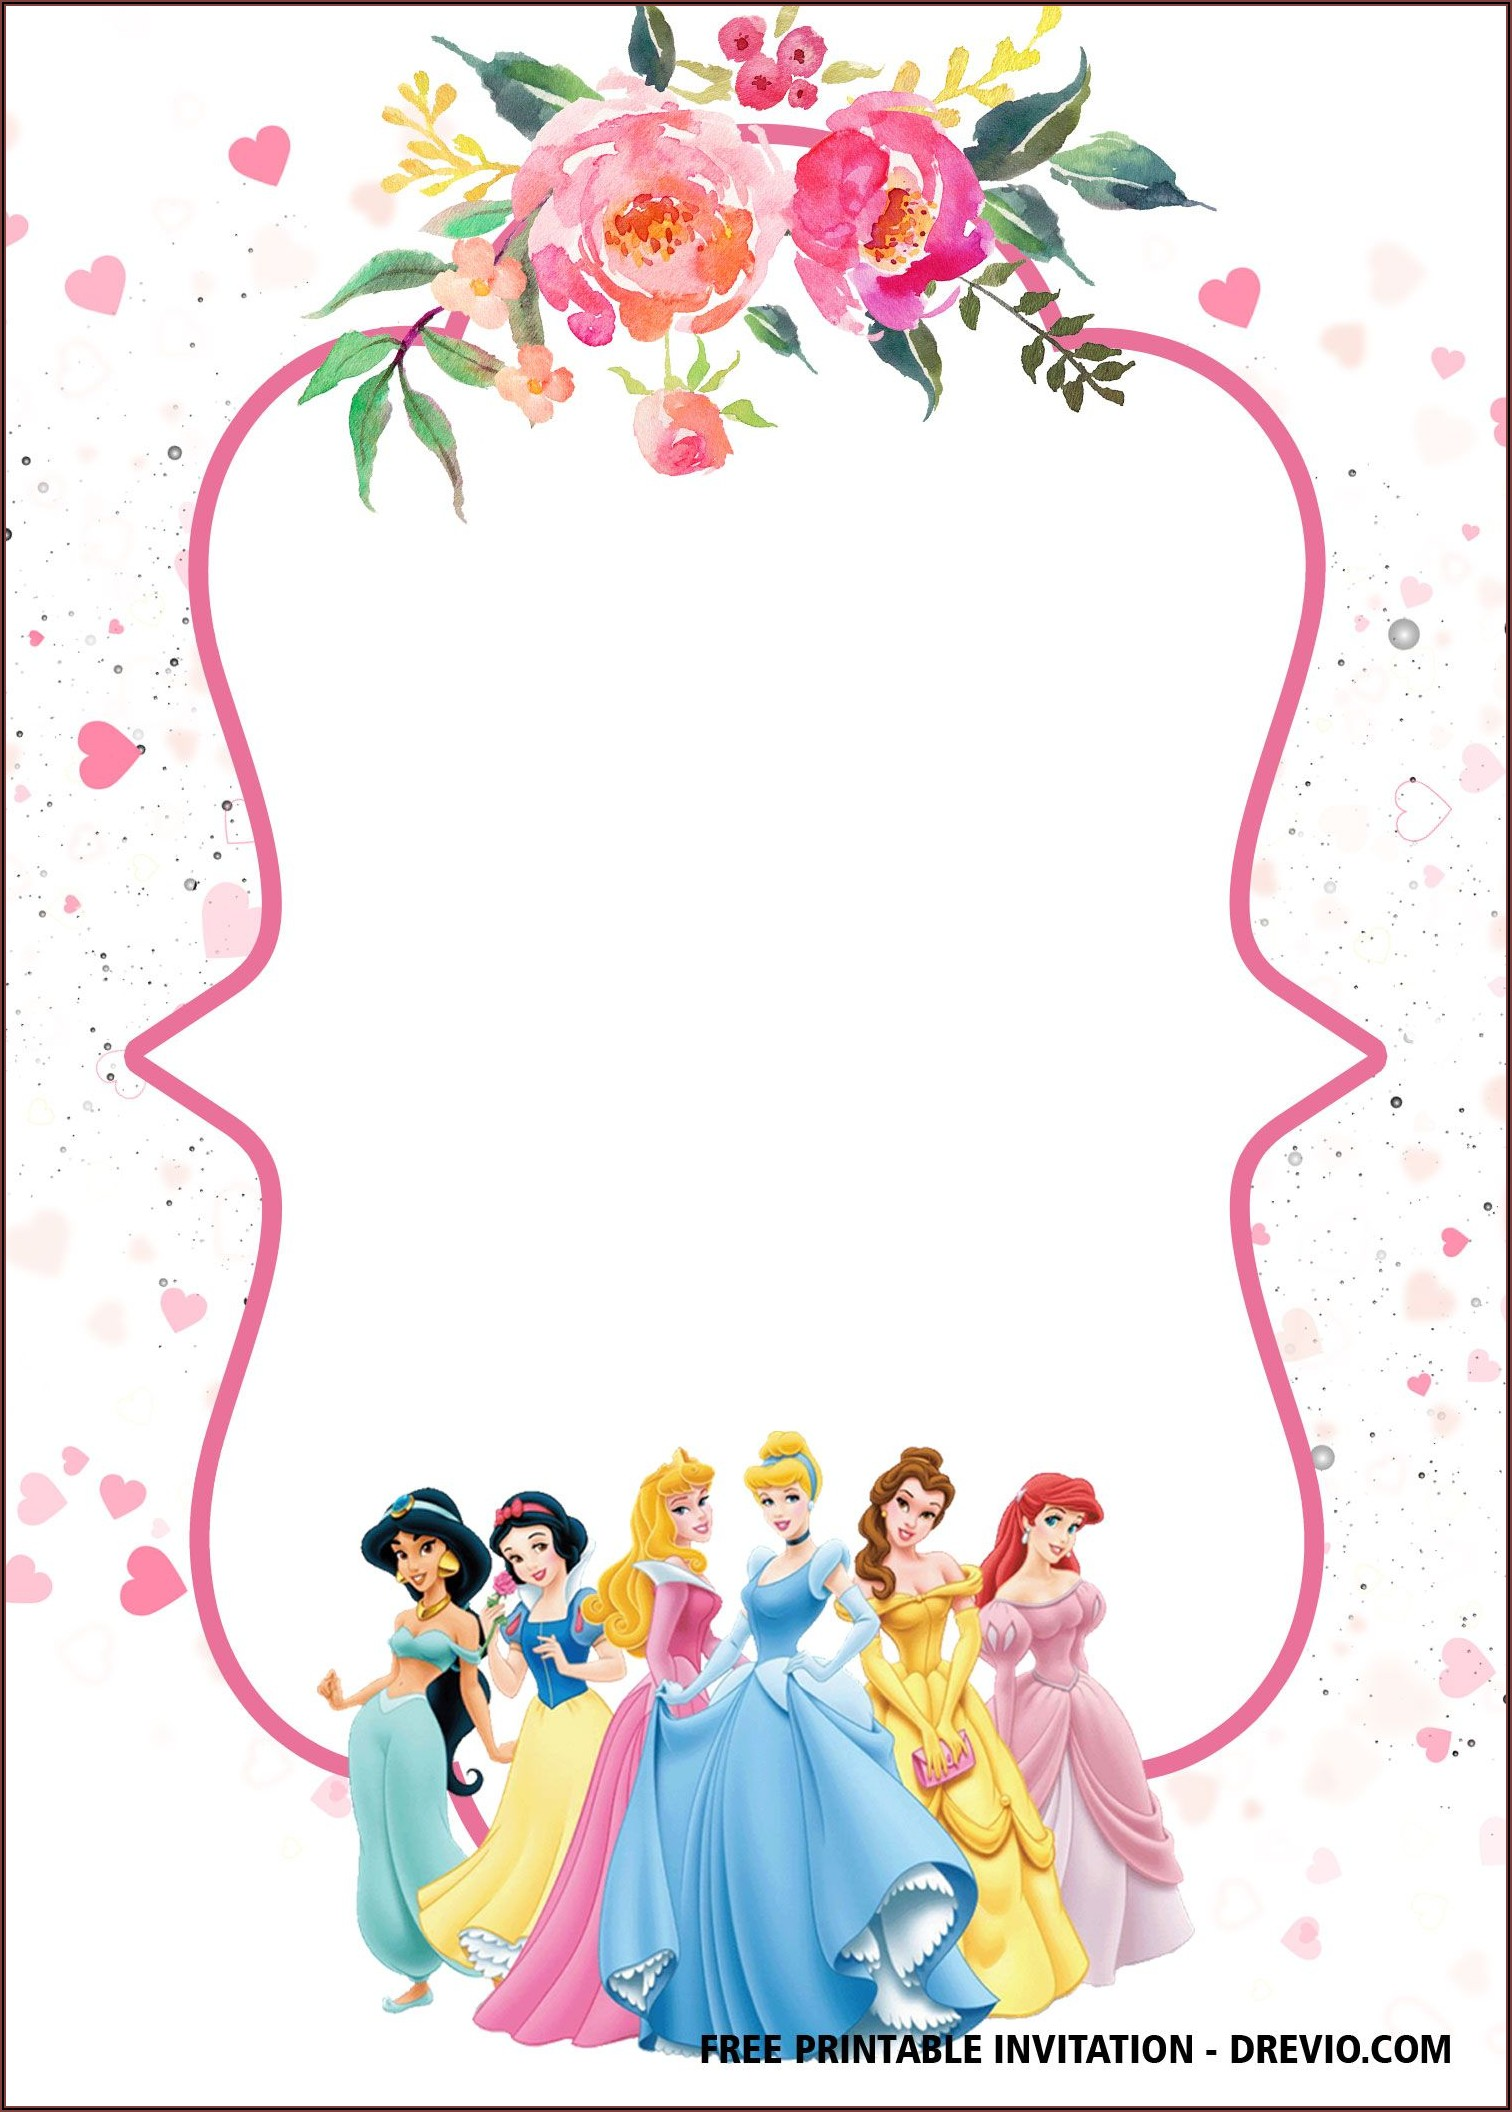 Disney Princess Party Invitations Templates Free